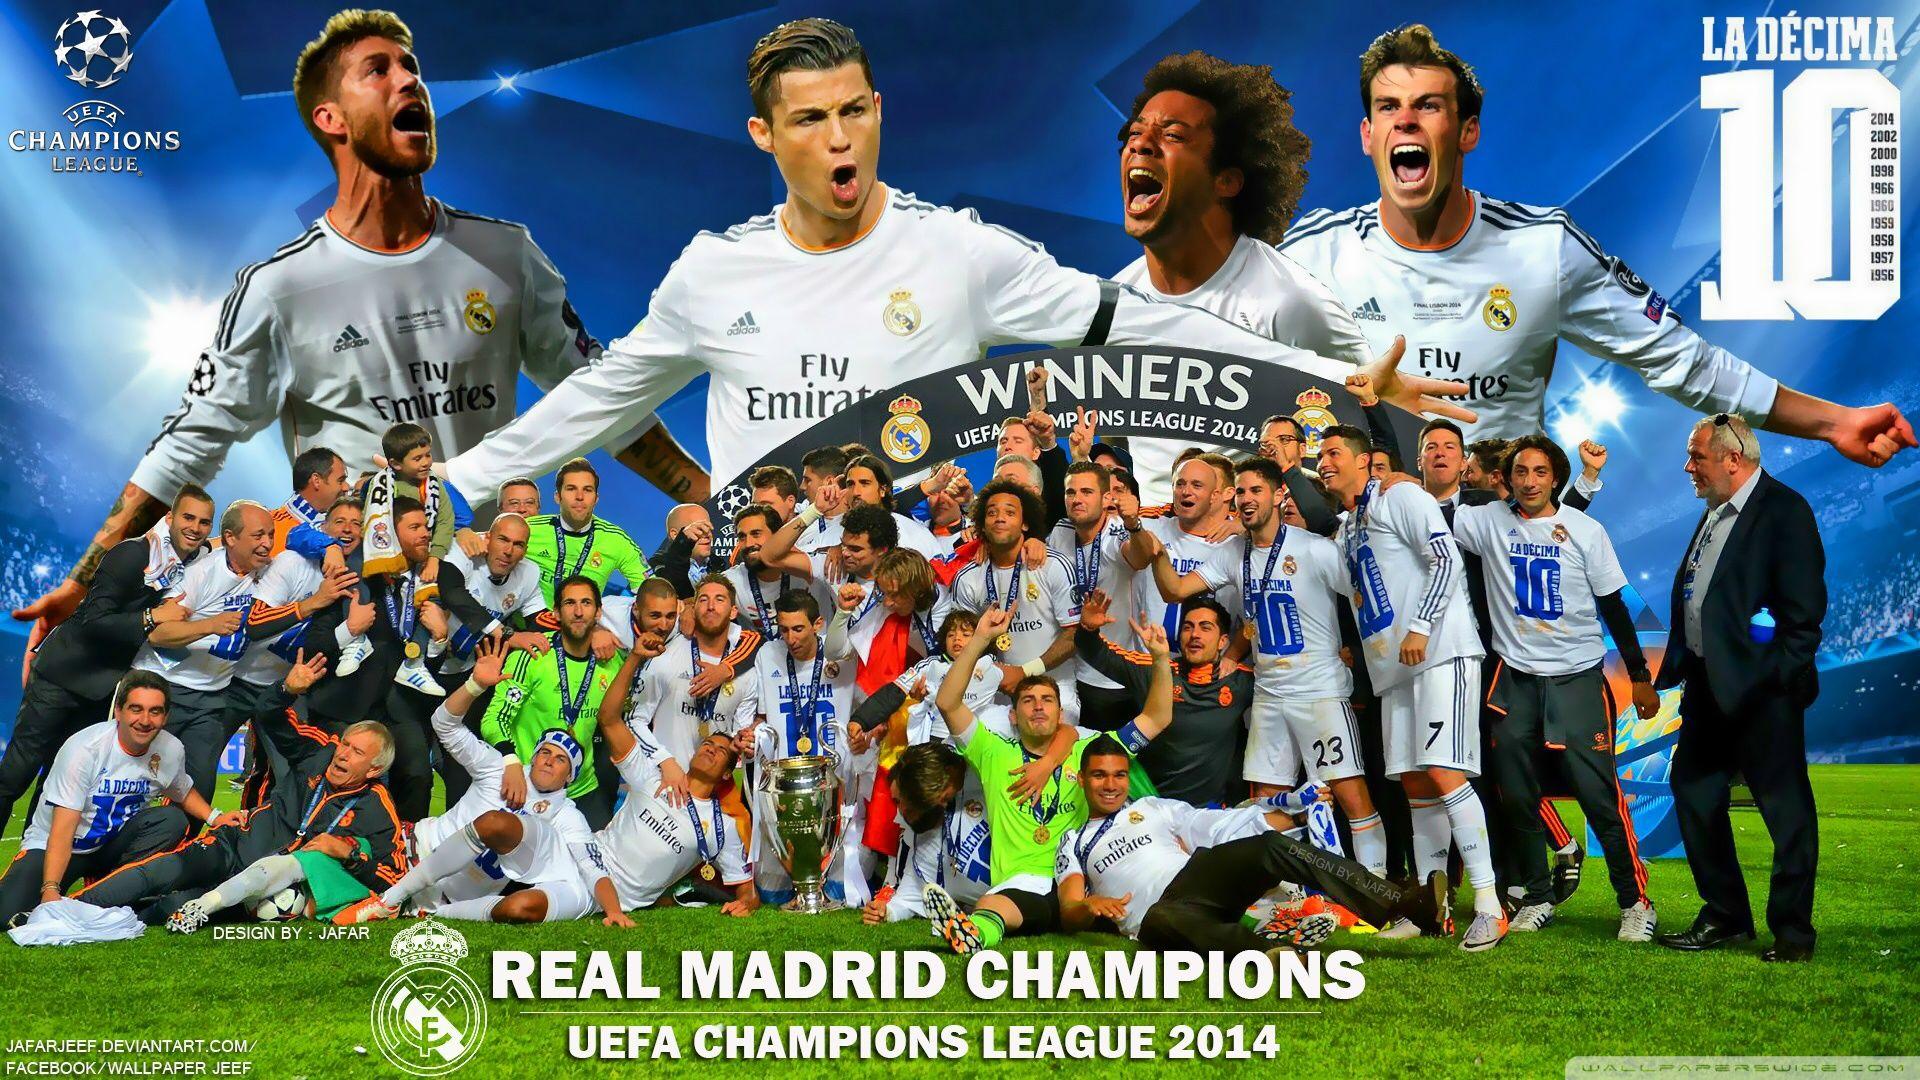 Wallpaper real madrid for windows xp - Real Madrid Winners Champions League 2014 Hd Desktop Wallpaper